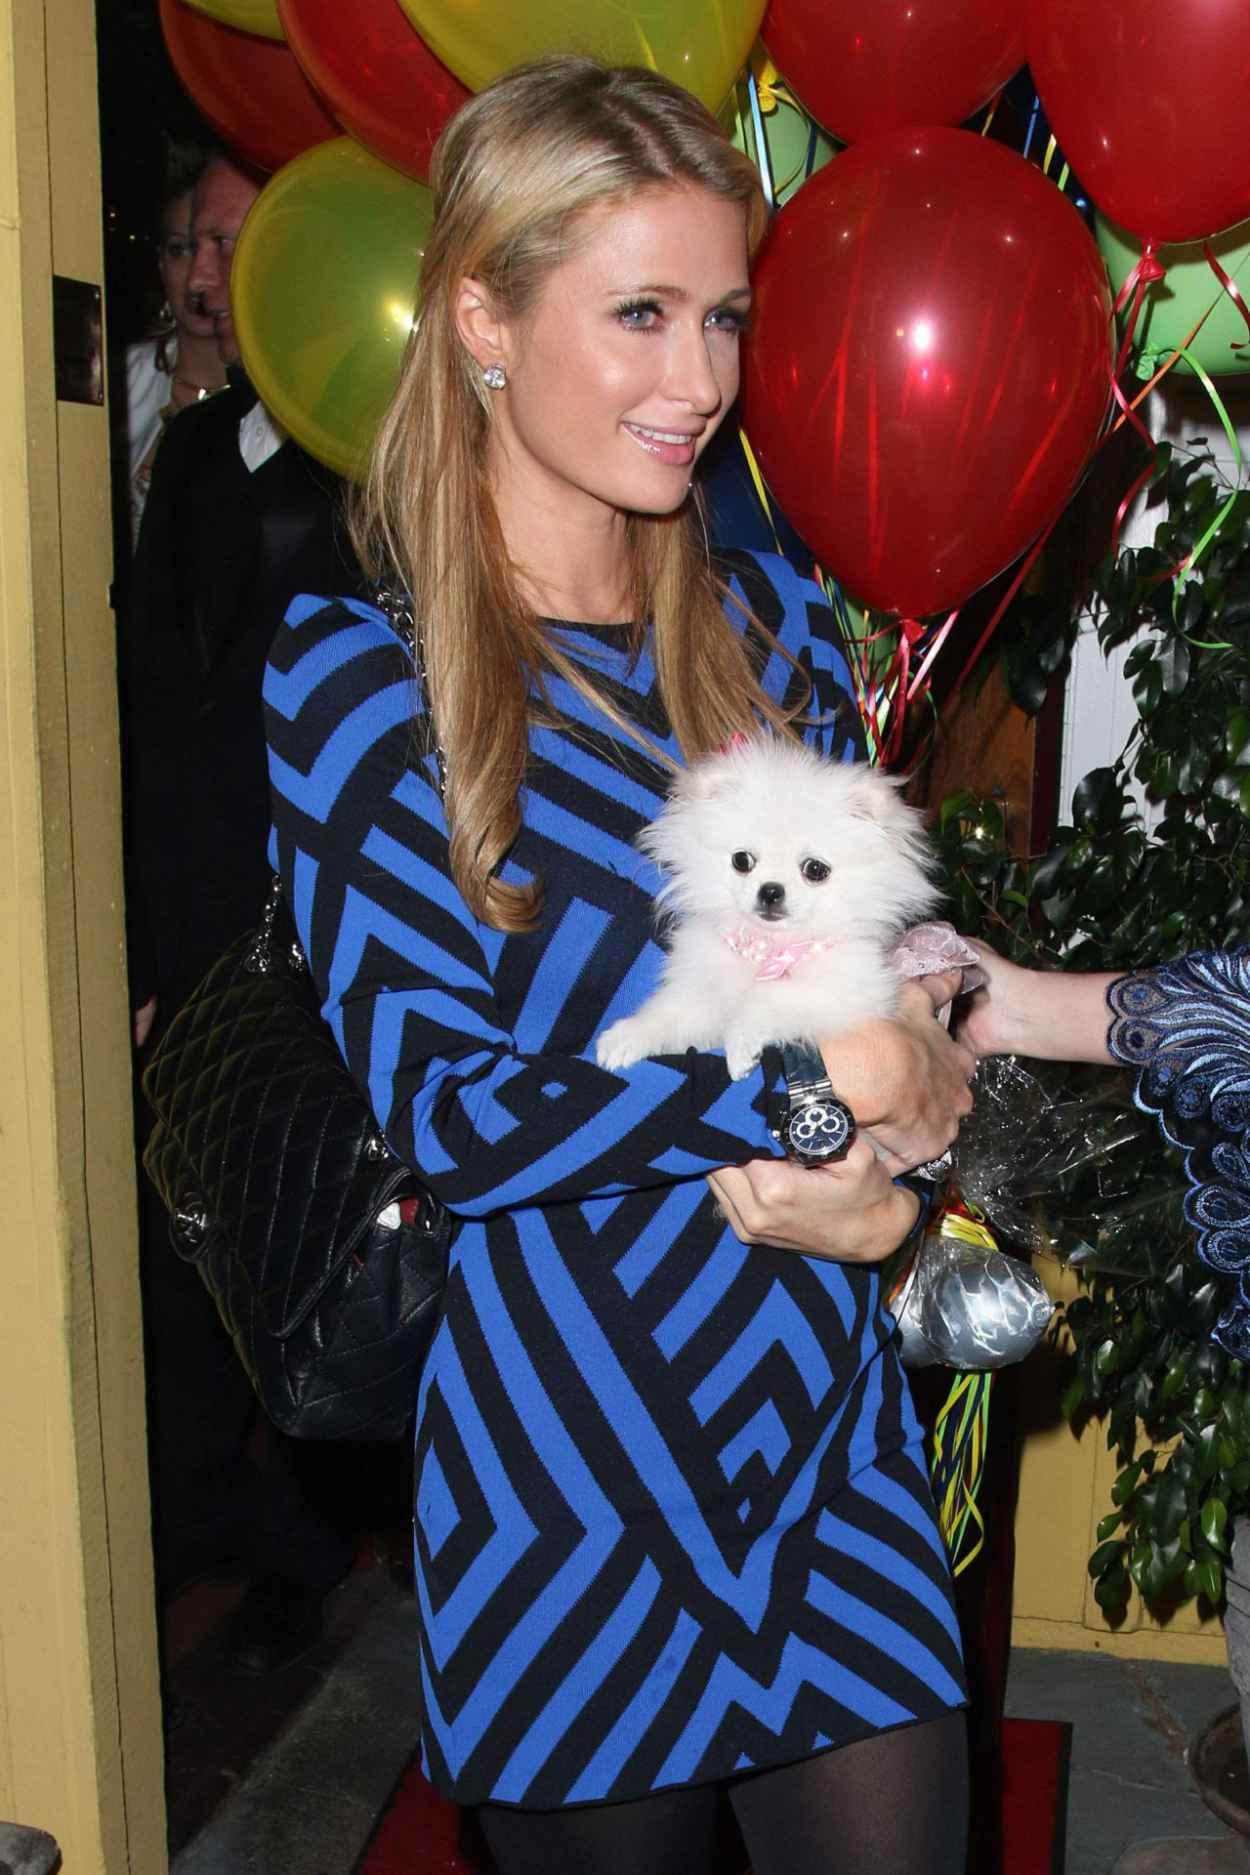 Paris Hilton at Dantanas Restaurant For Celebrating Her Birthday, February 2015-1